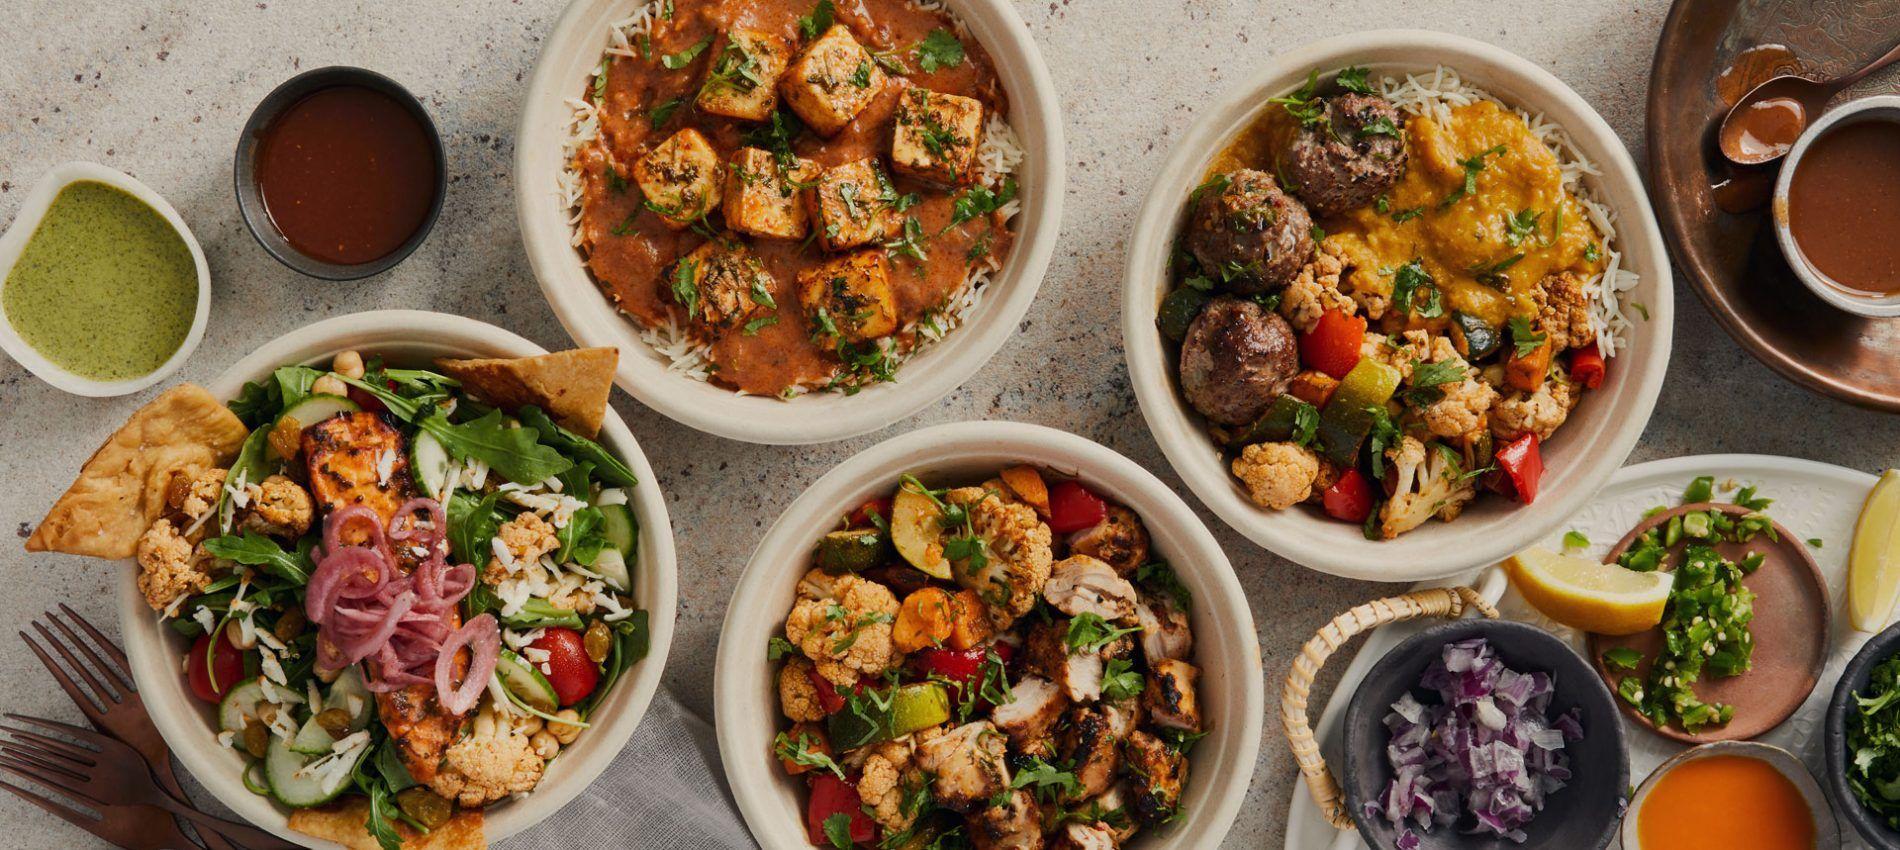 salmon choolaah salad, lamb perfect balance bowl, chicken pro bowl and the paneer choolaah bowl